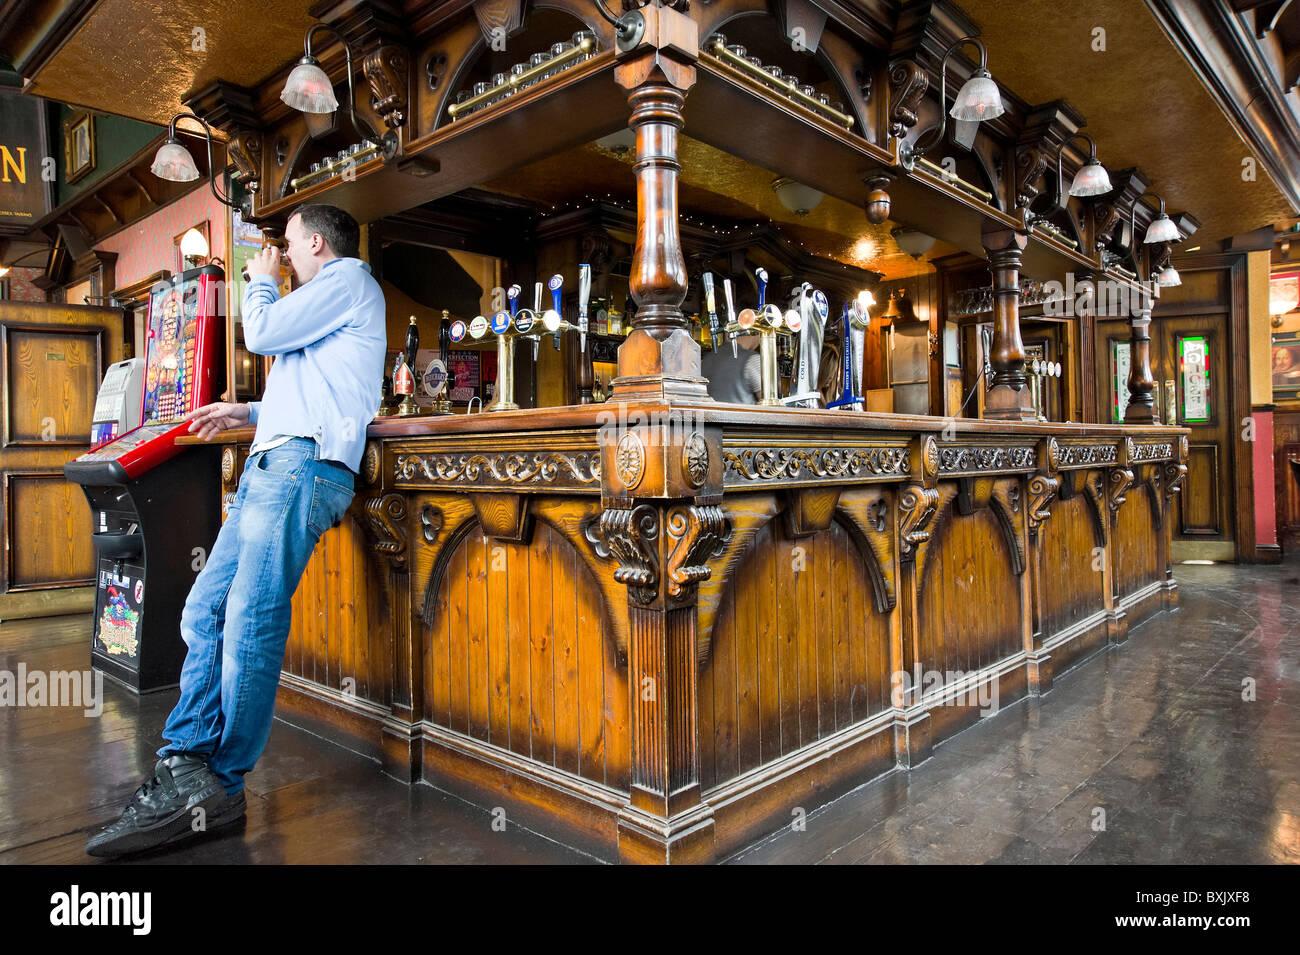 Le monde pub, London, England, UK Photo Stock